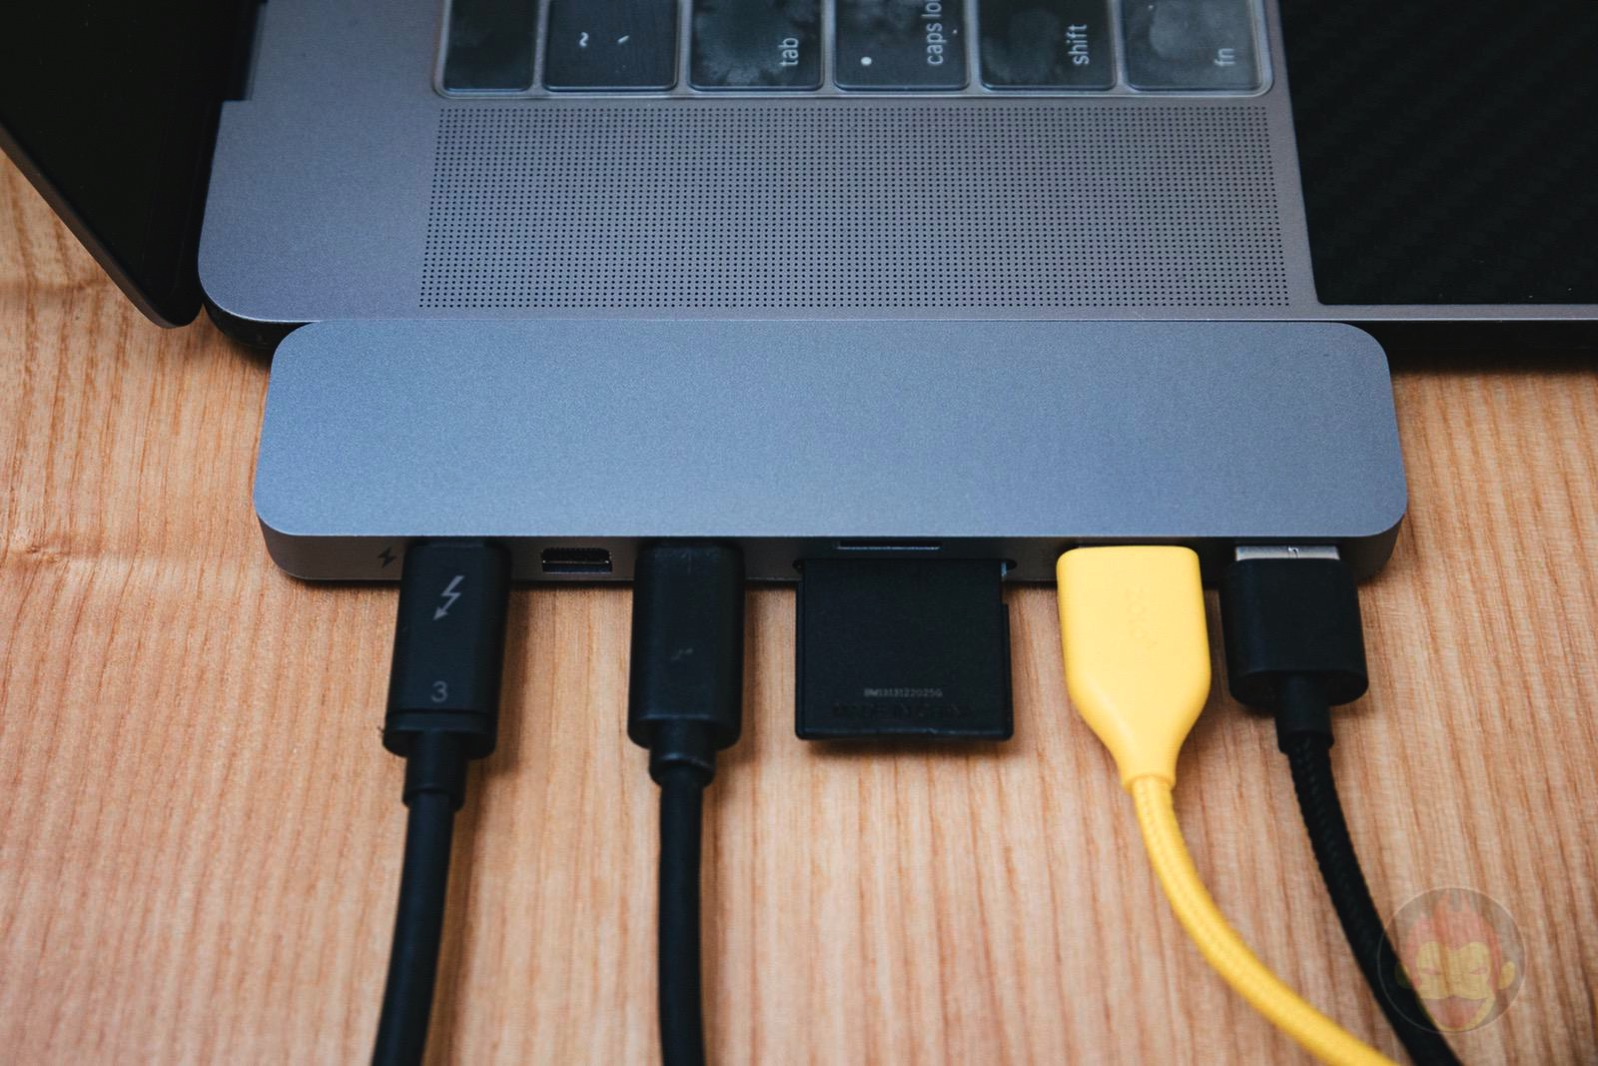 HyperDrive PRO USBC Hub 06